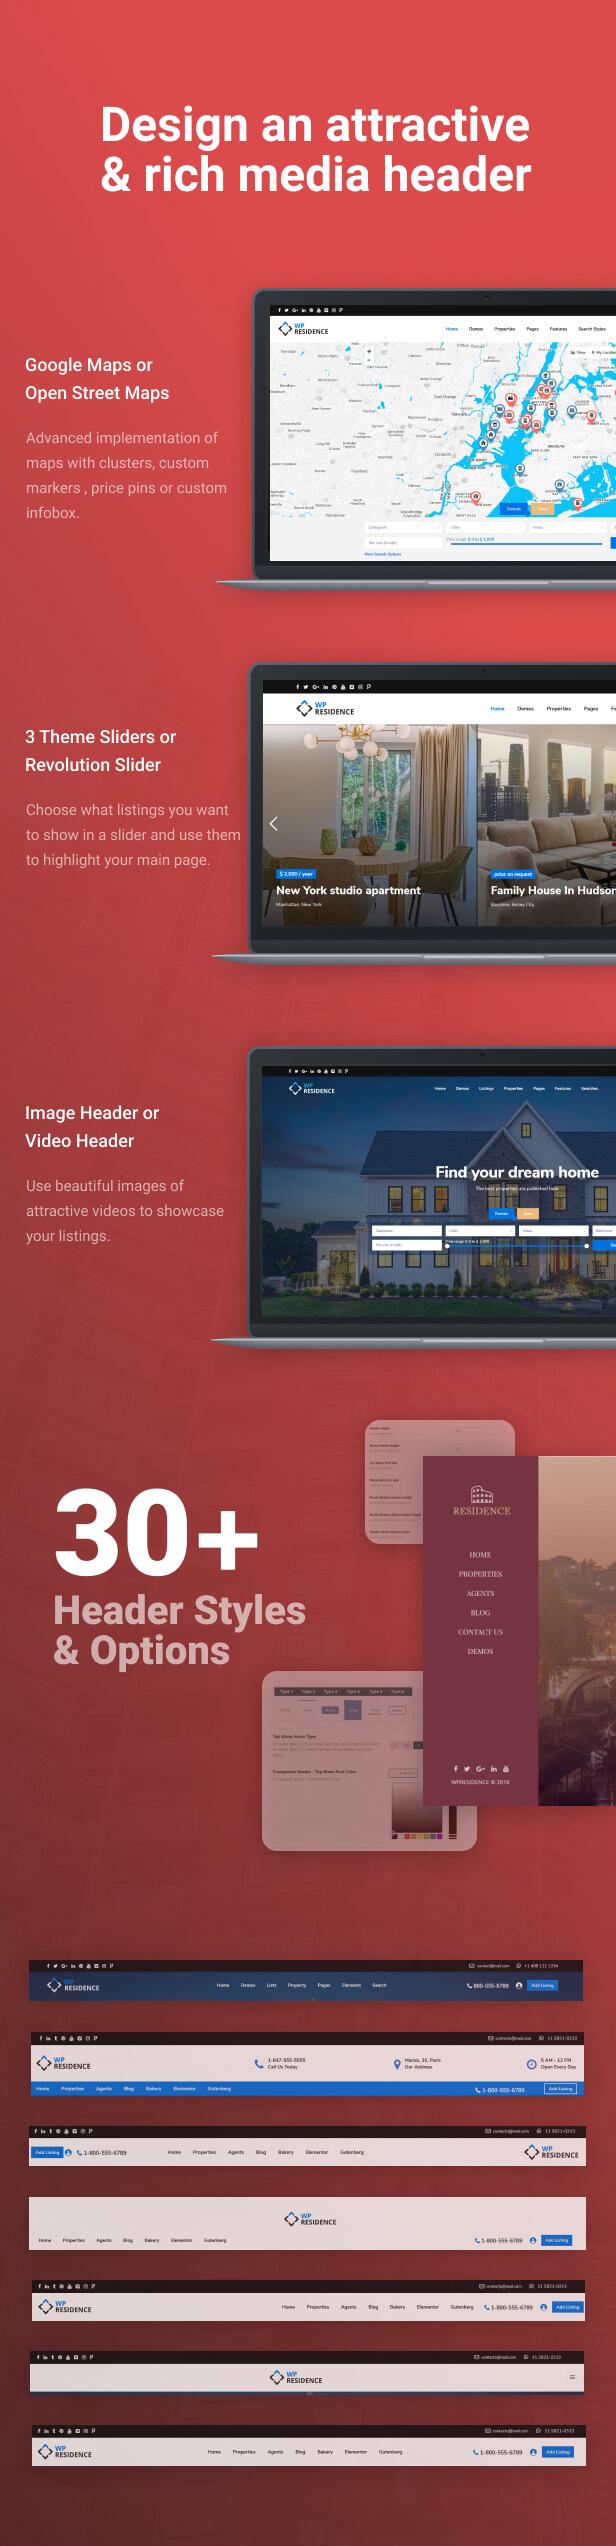 header options - Residence Real Estate WordPress Theme